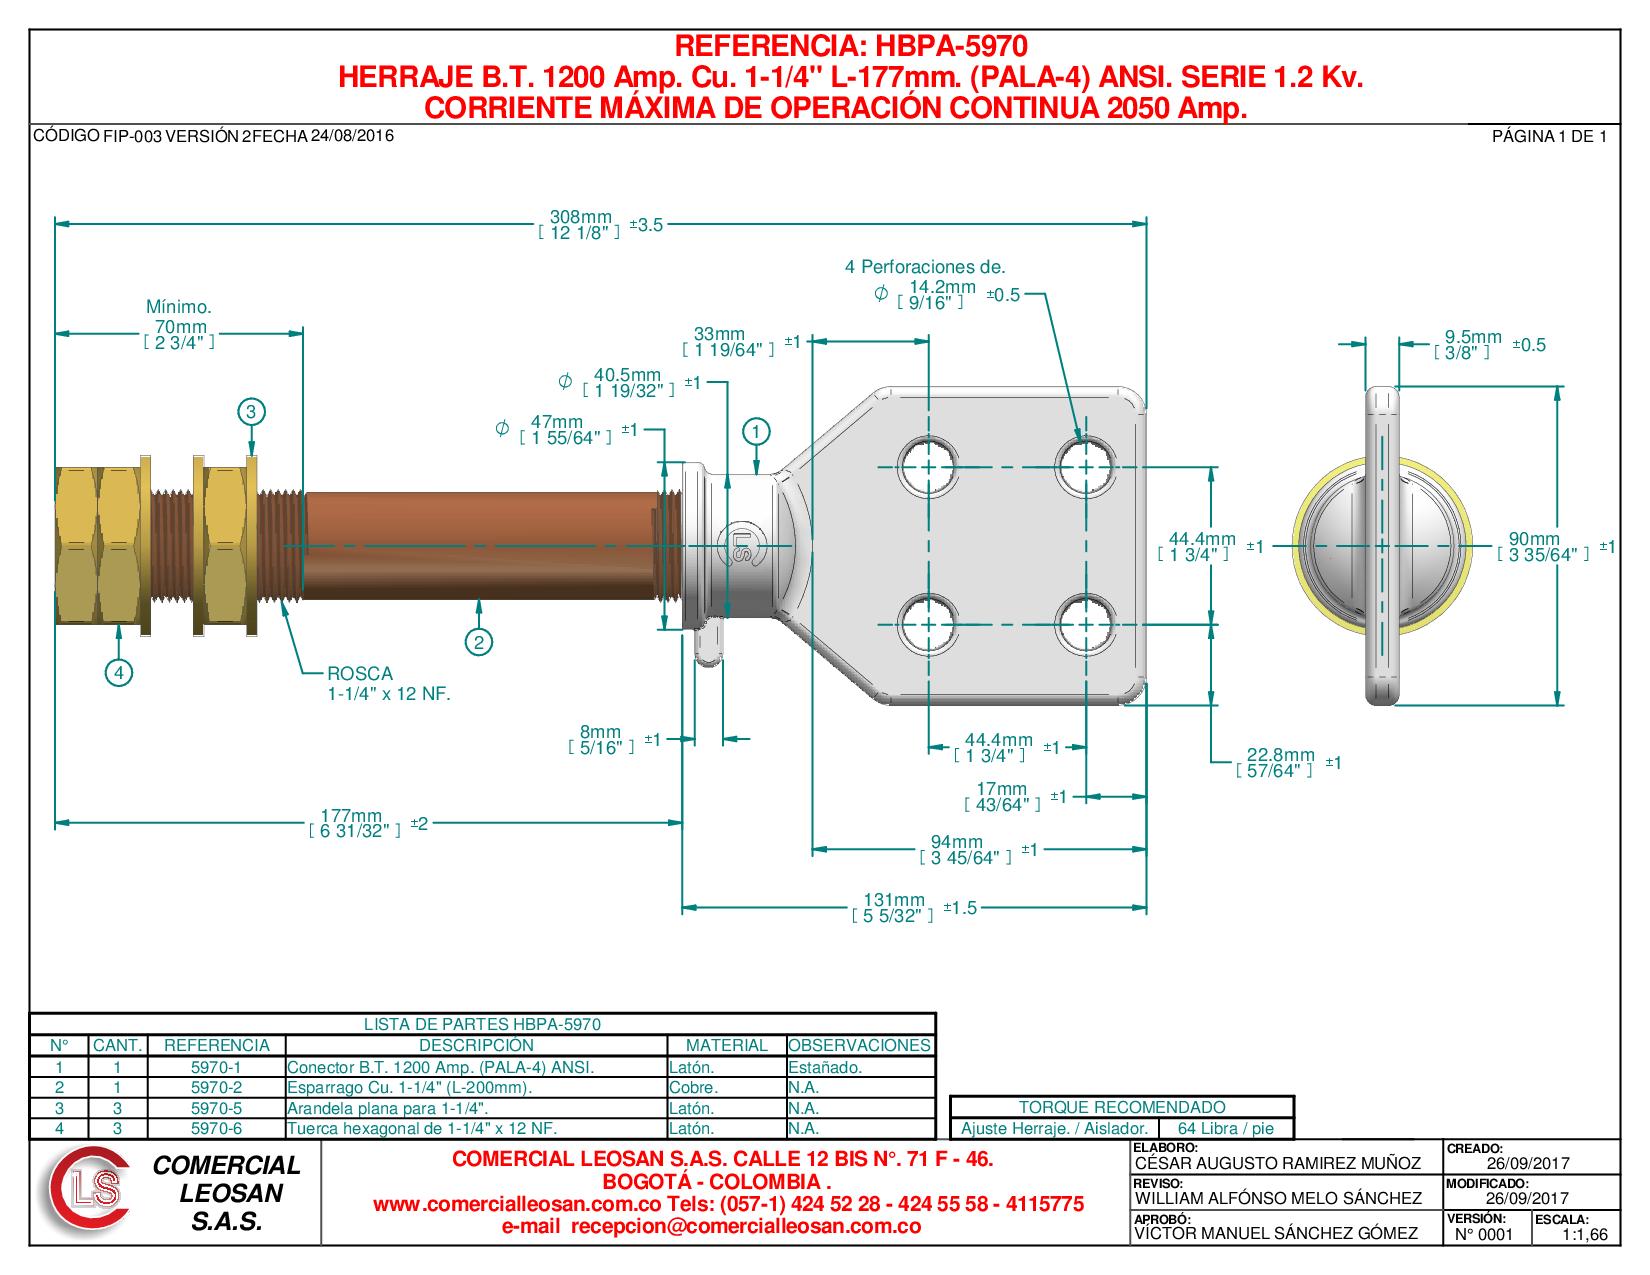 "HERRAJE B.T. 1200 Amp. Cu. 1-1/4"" L-177mm. (PALA-4) ANSI. SERIE 1,2 Kv."